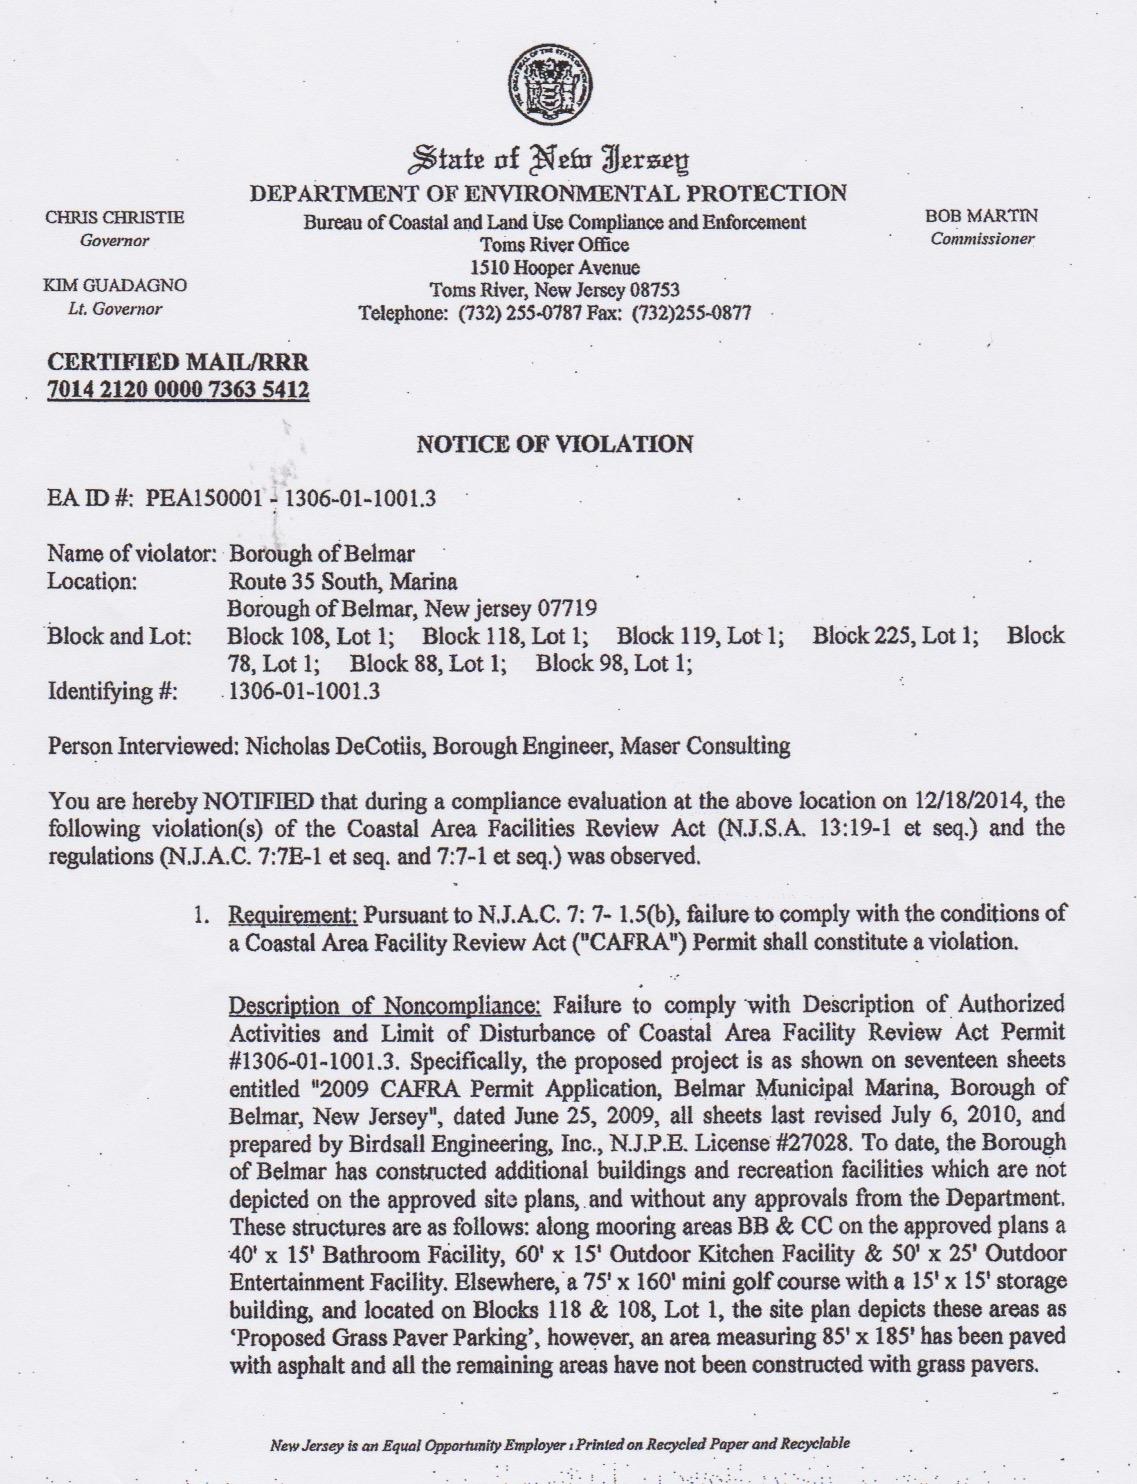 cafra violation notice